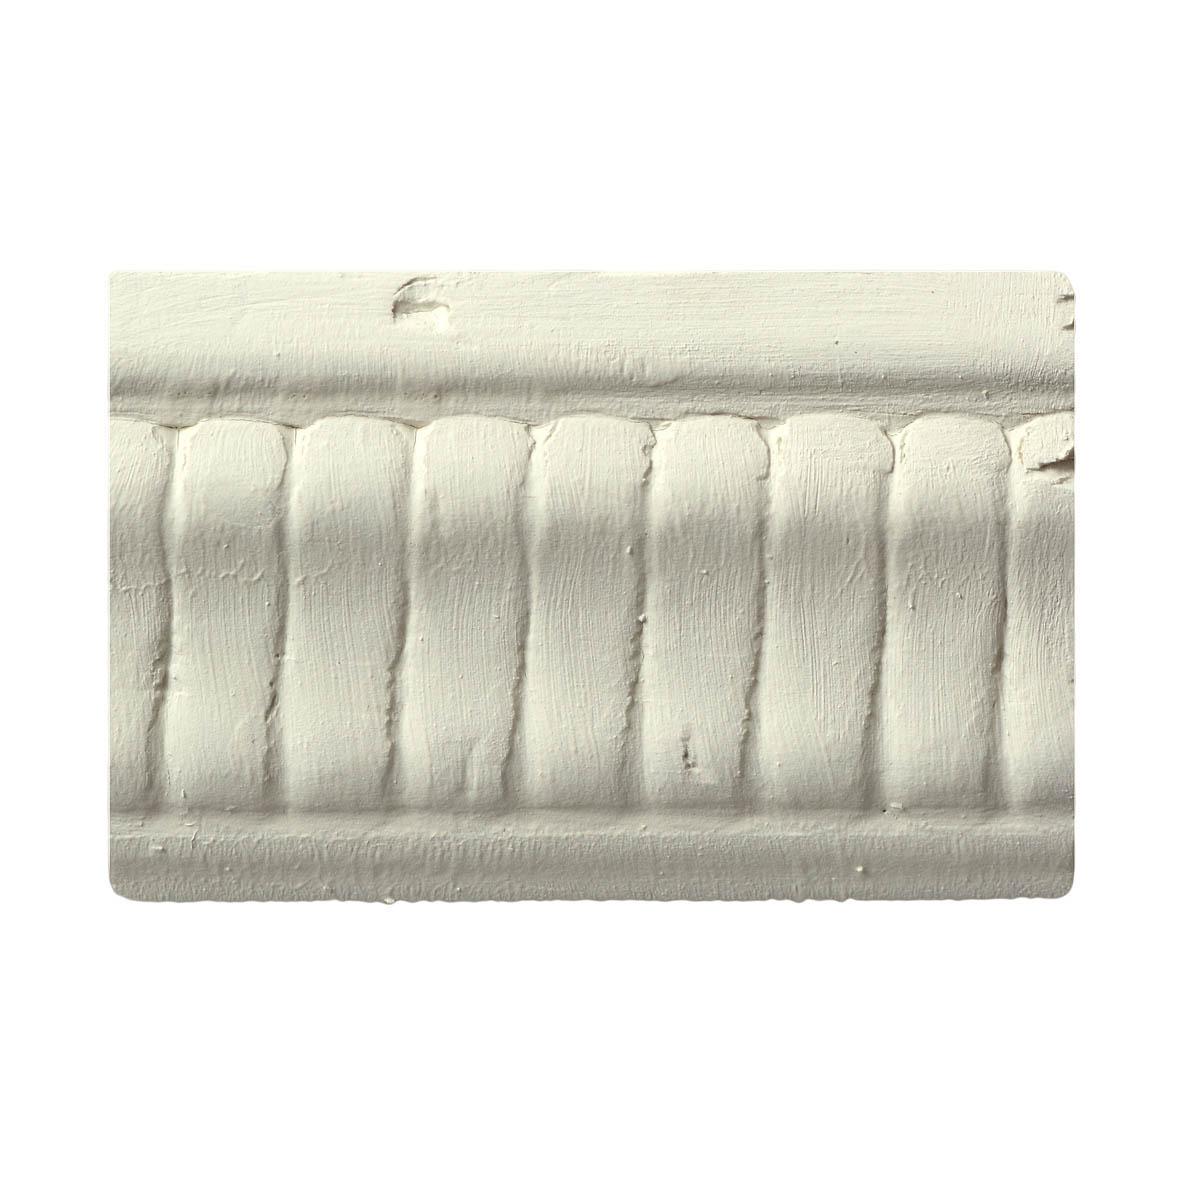 Waverly ® Inspirations Chalk Finish Acrylic Paint - Plaster, 2 oz.